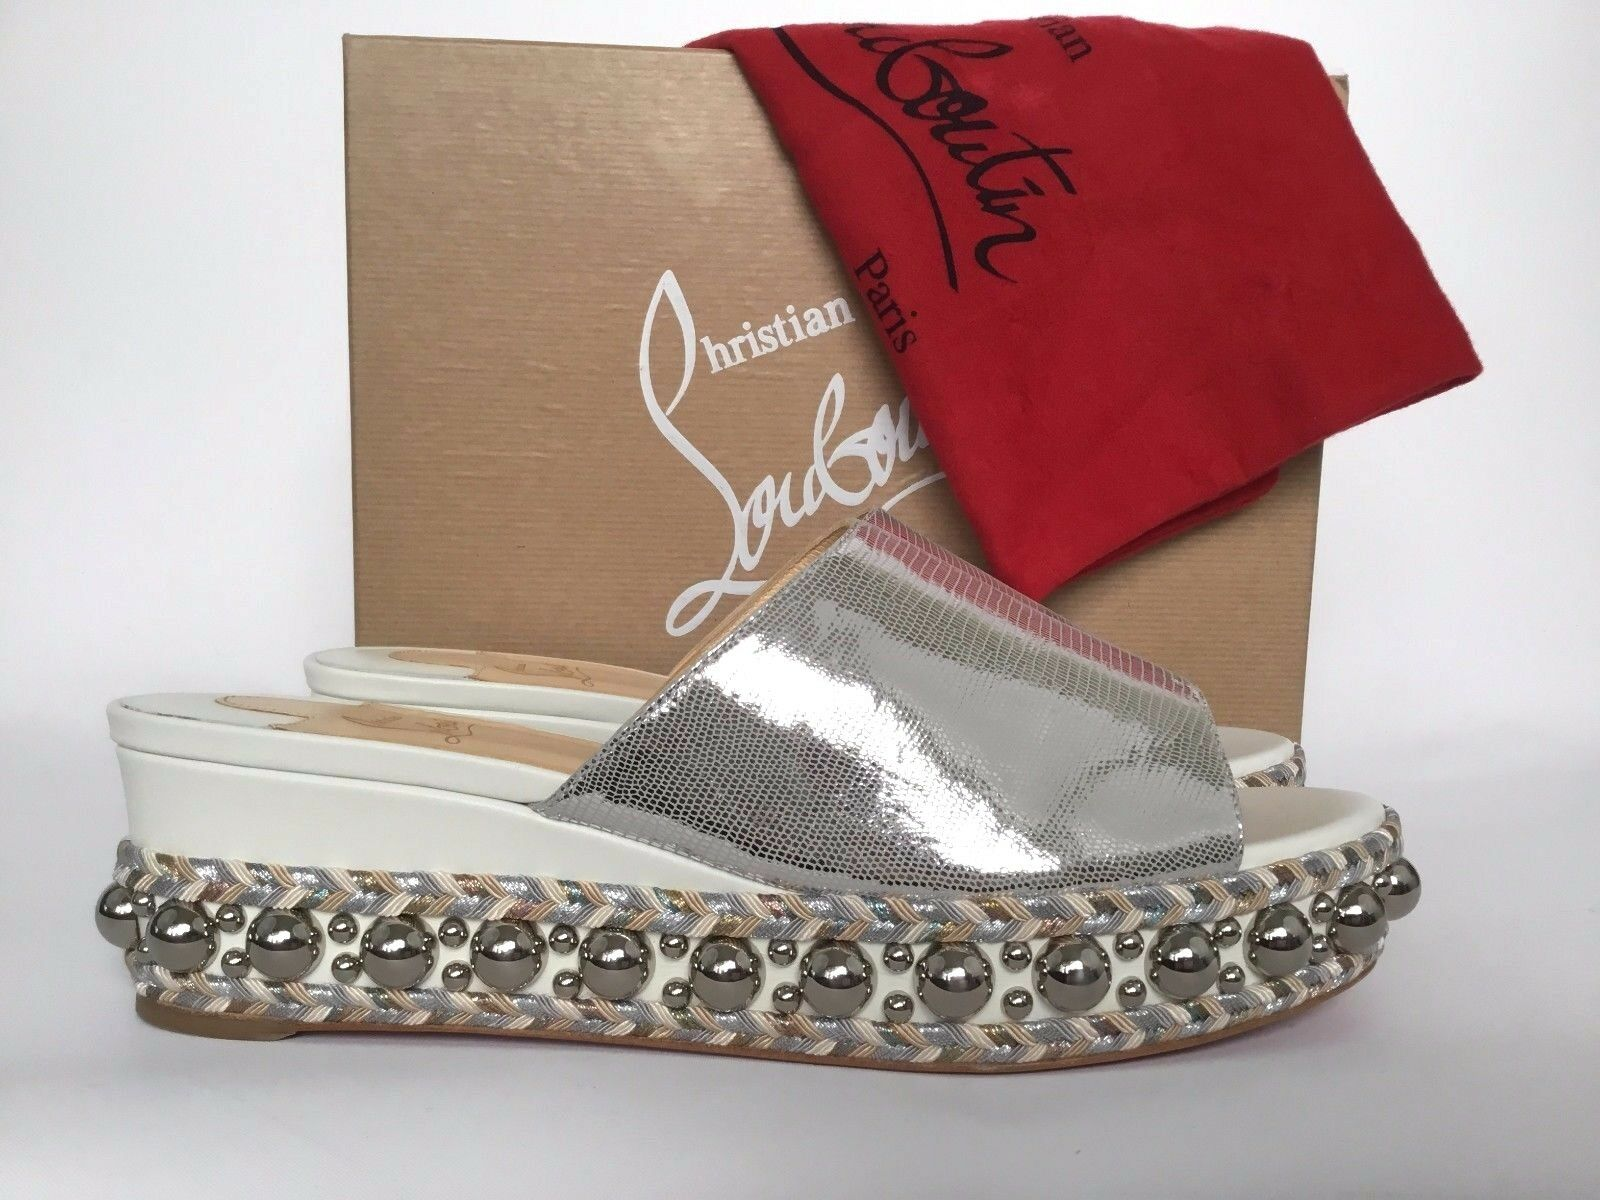 Christian Louboutin JANIBASSE 60mm 60mm 60mm Silver Leather Stud Platform Mule Slide 41 11 a72c70